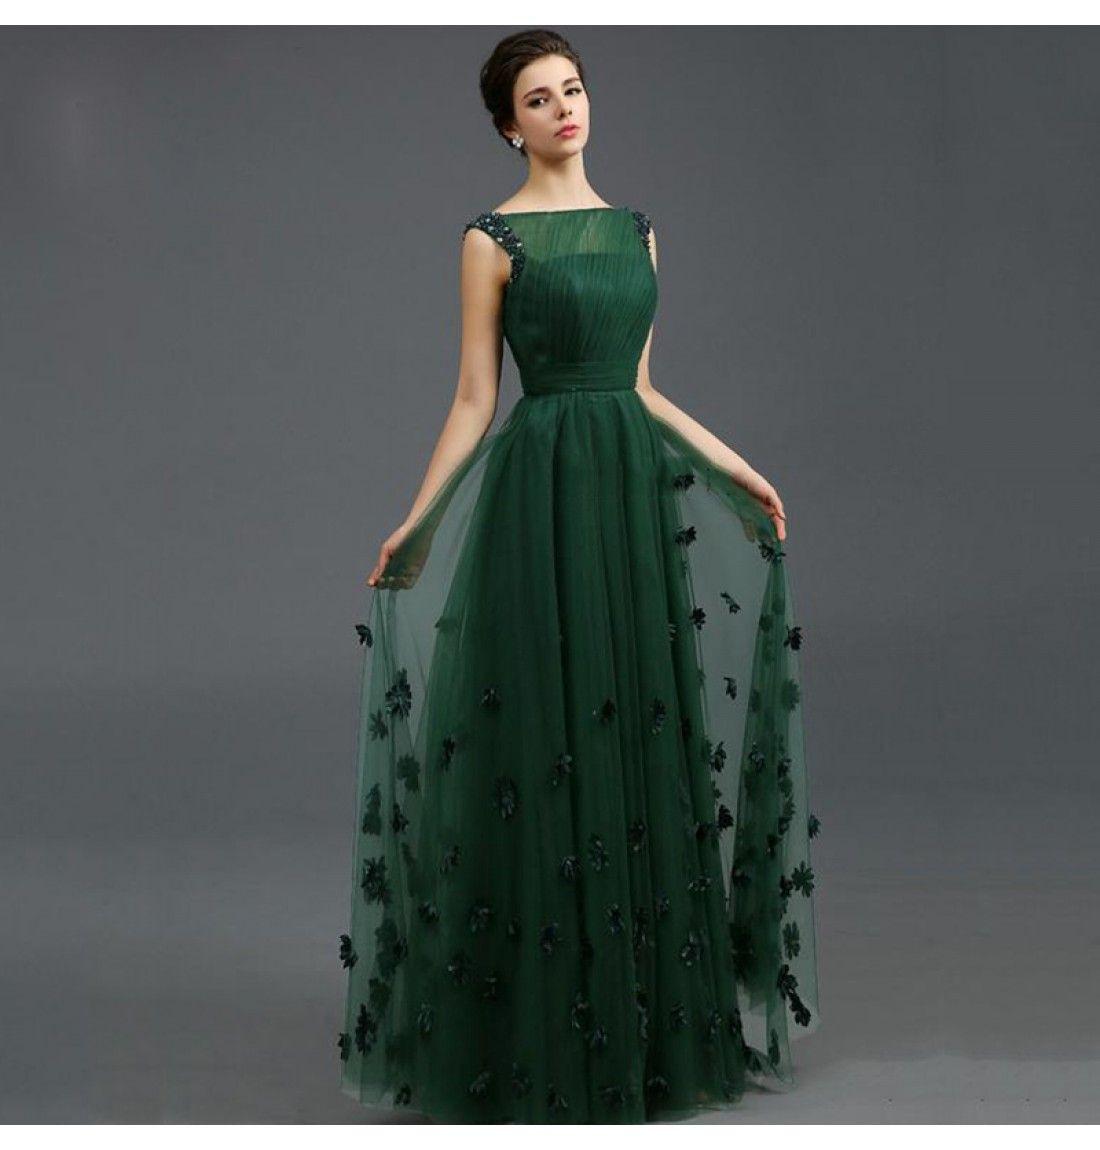 13 Schön Abendkleid Vintage Spezialgebiet10 Top Abendkleid Vintage Bester Preis